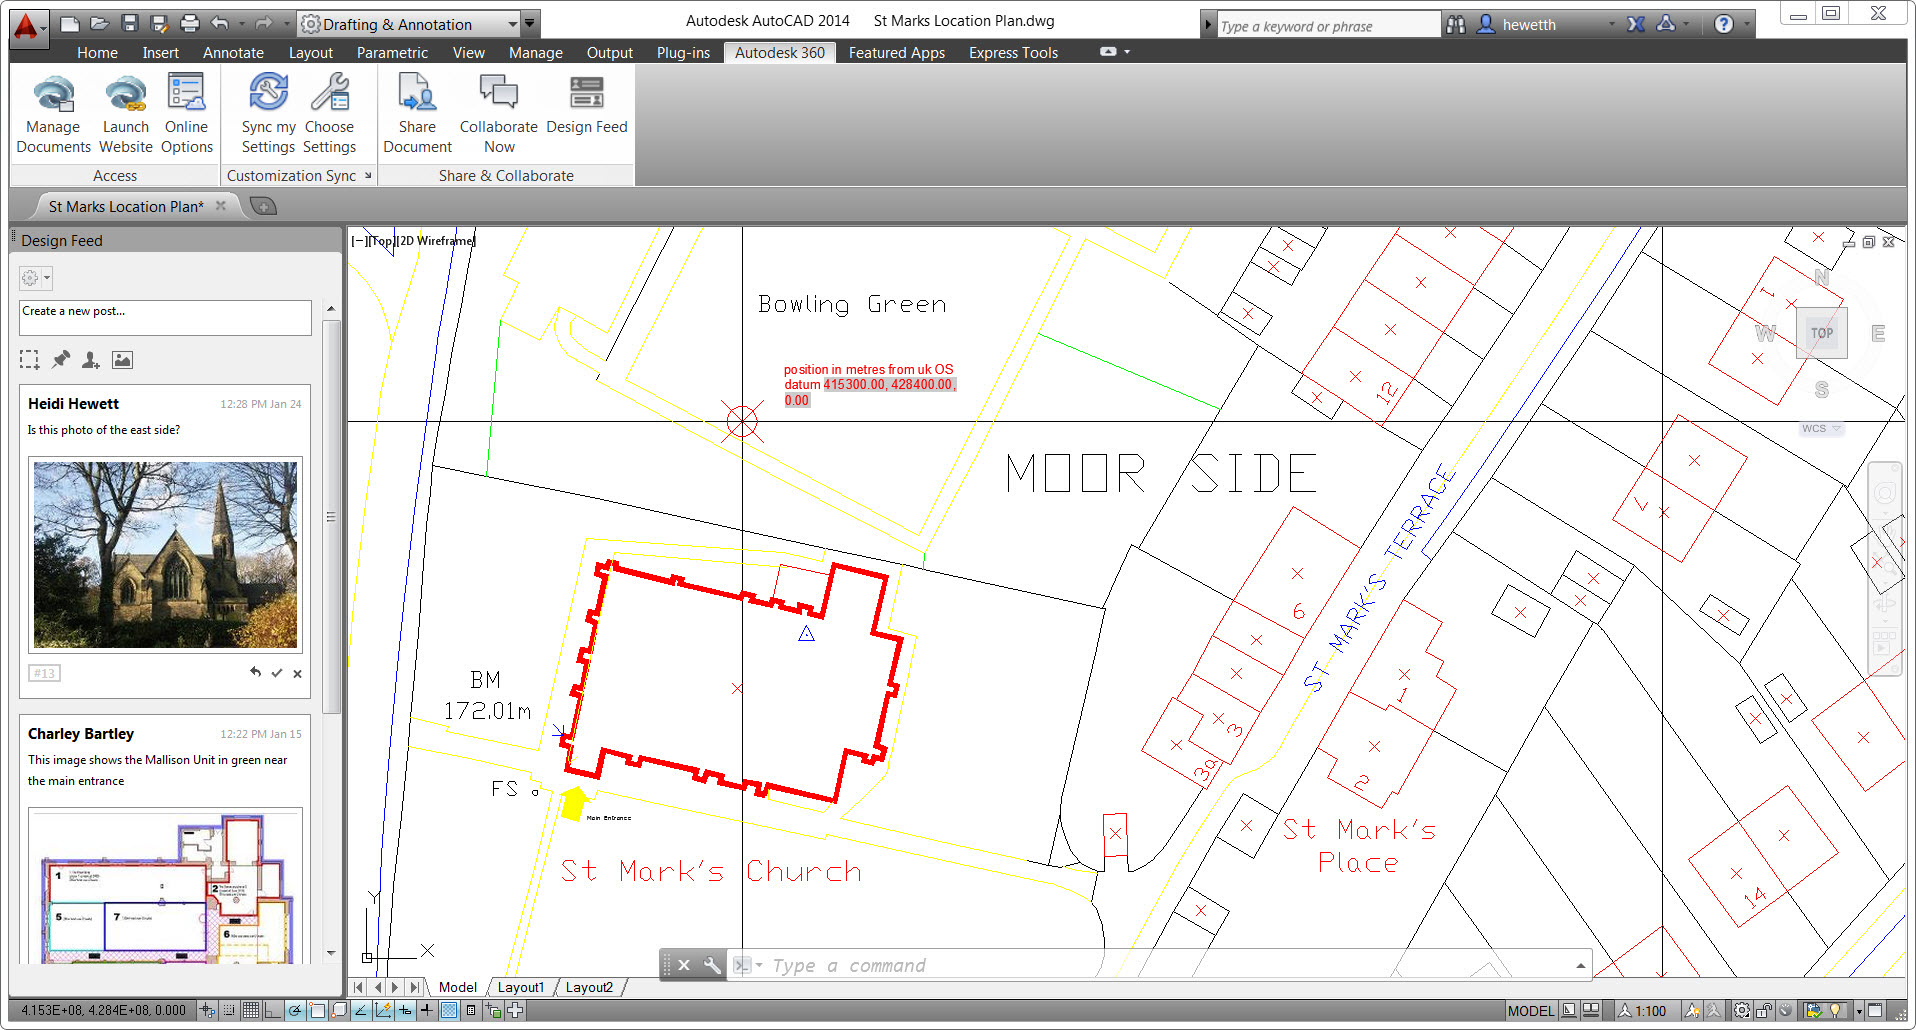 Software proiectare generala - Autodesk AutoCAD AUTODESK - Poza 5